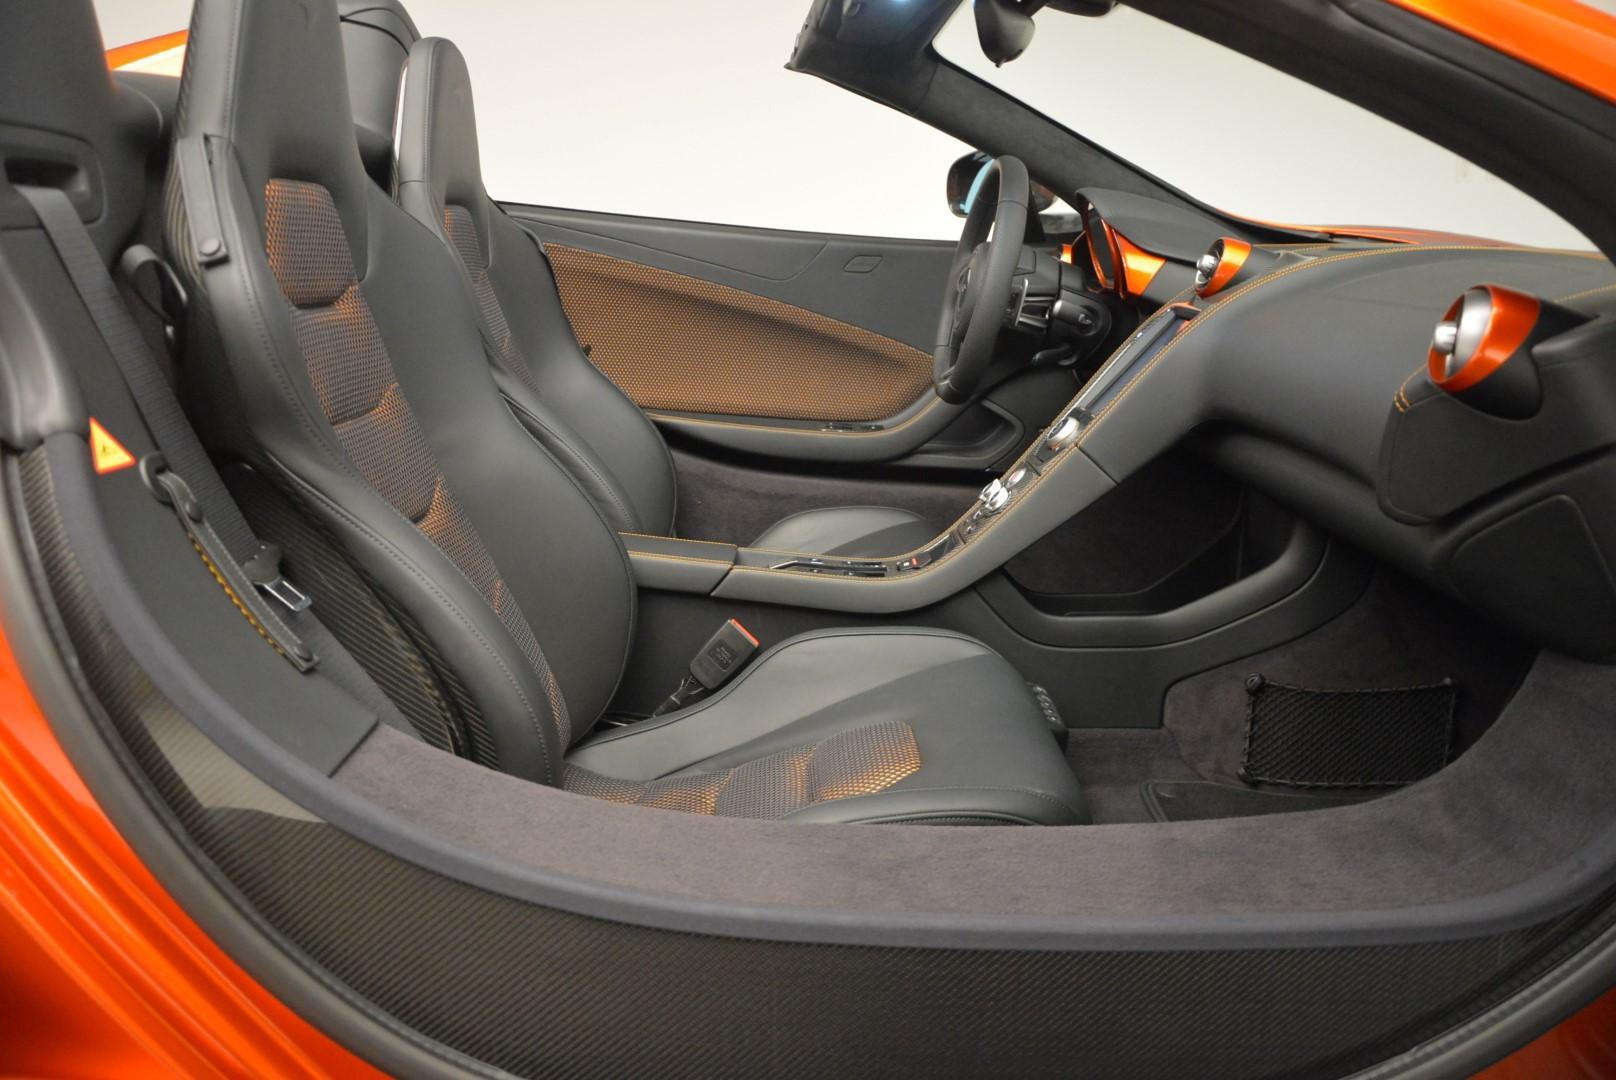 Used 2013 McLaren MP4-12C Base For Sale In Westport, CT 66_p26